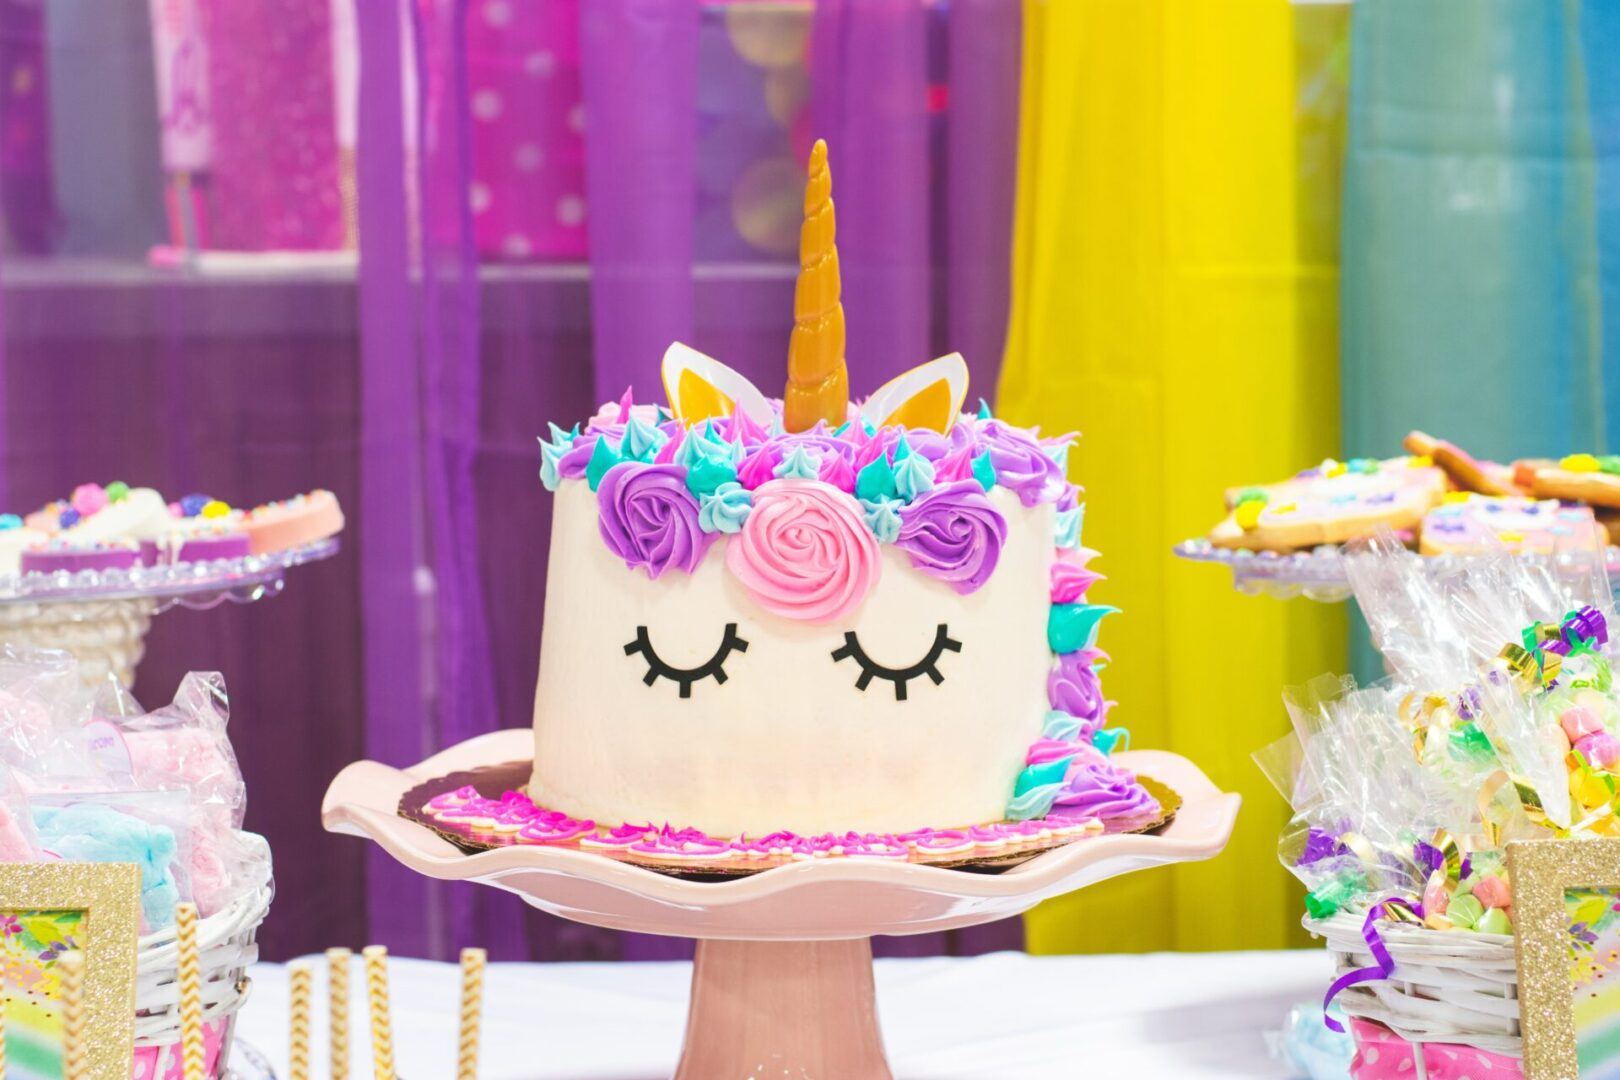 unicorn-fondant-cake-2274464